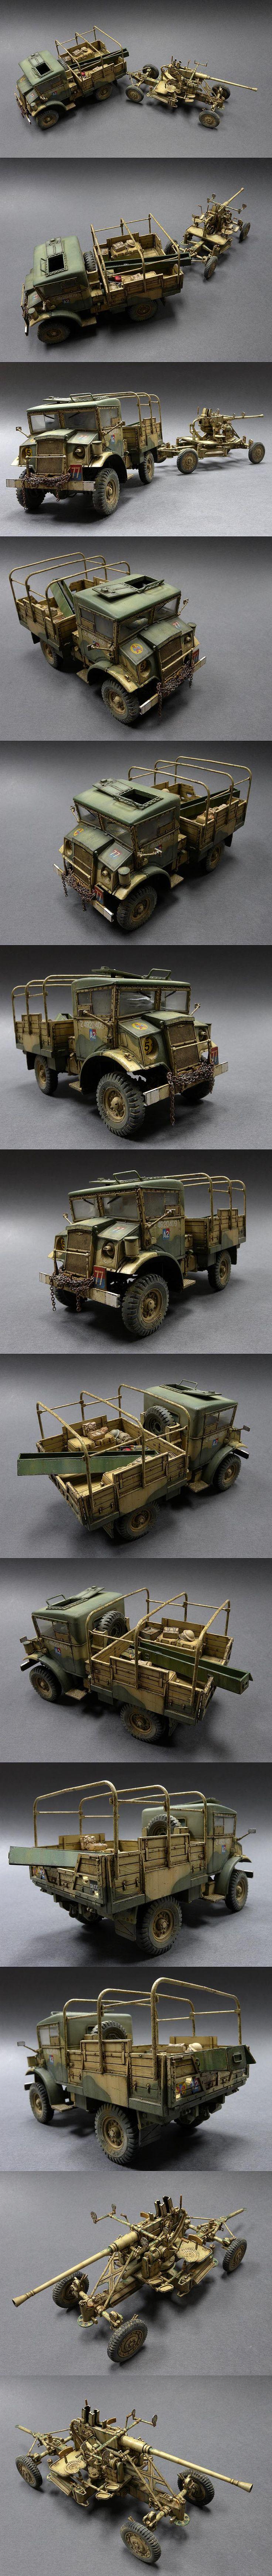 Chevrolet 15CWT & Bofors 40mm 1/35 Scale Model